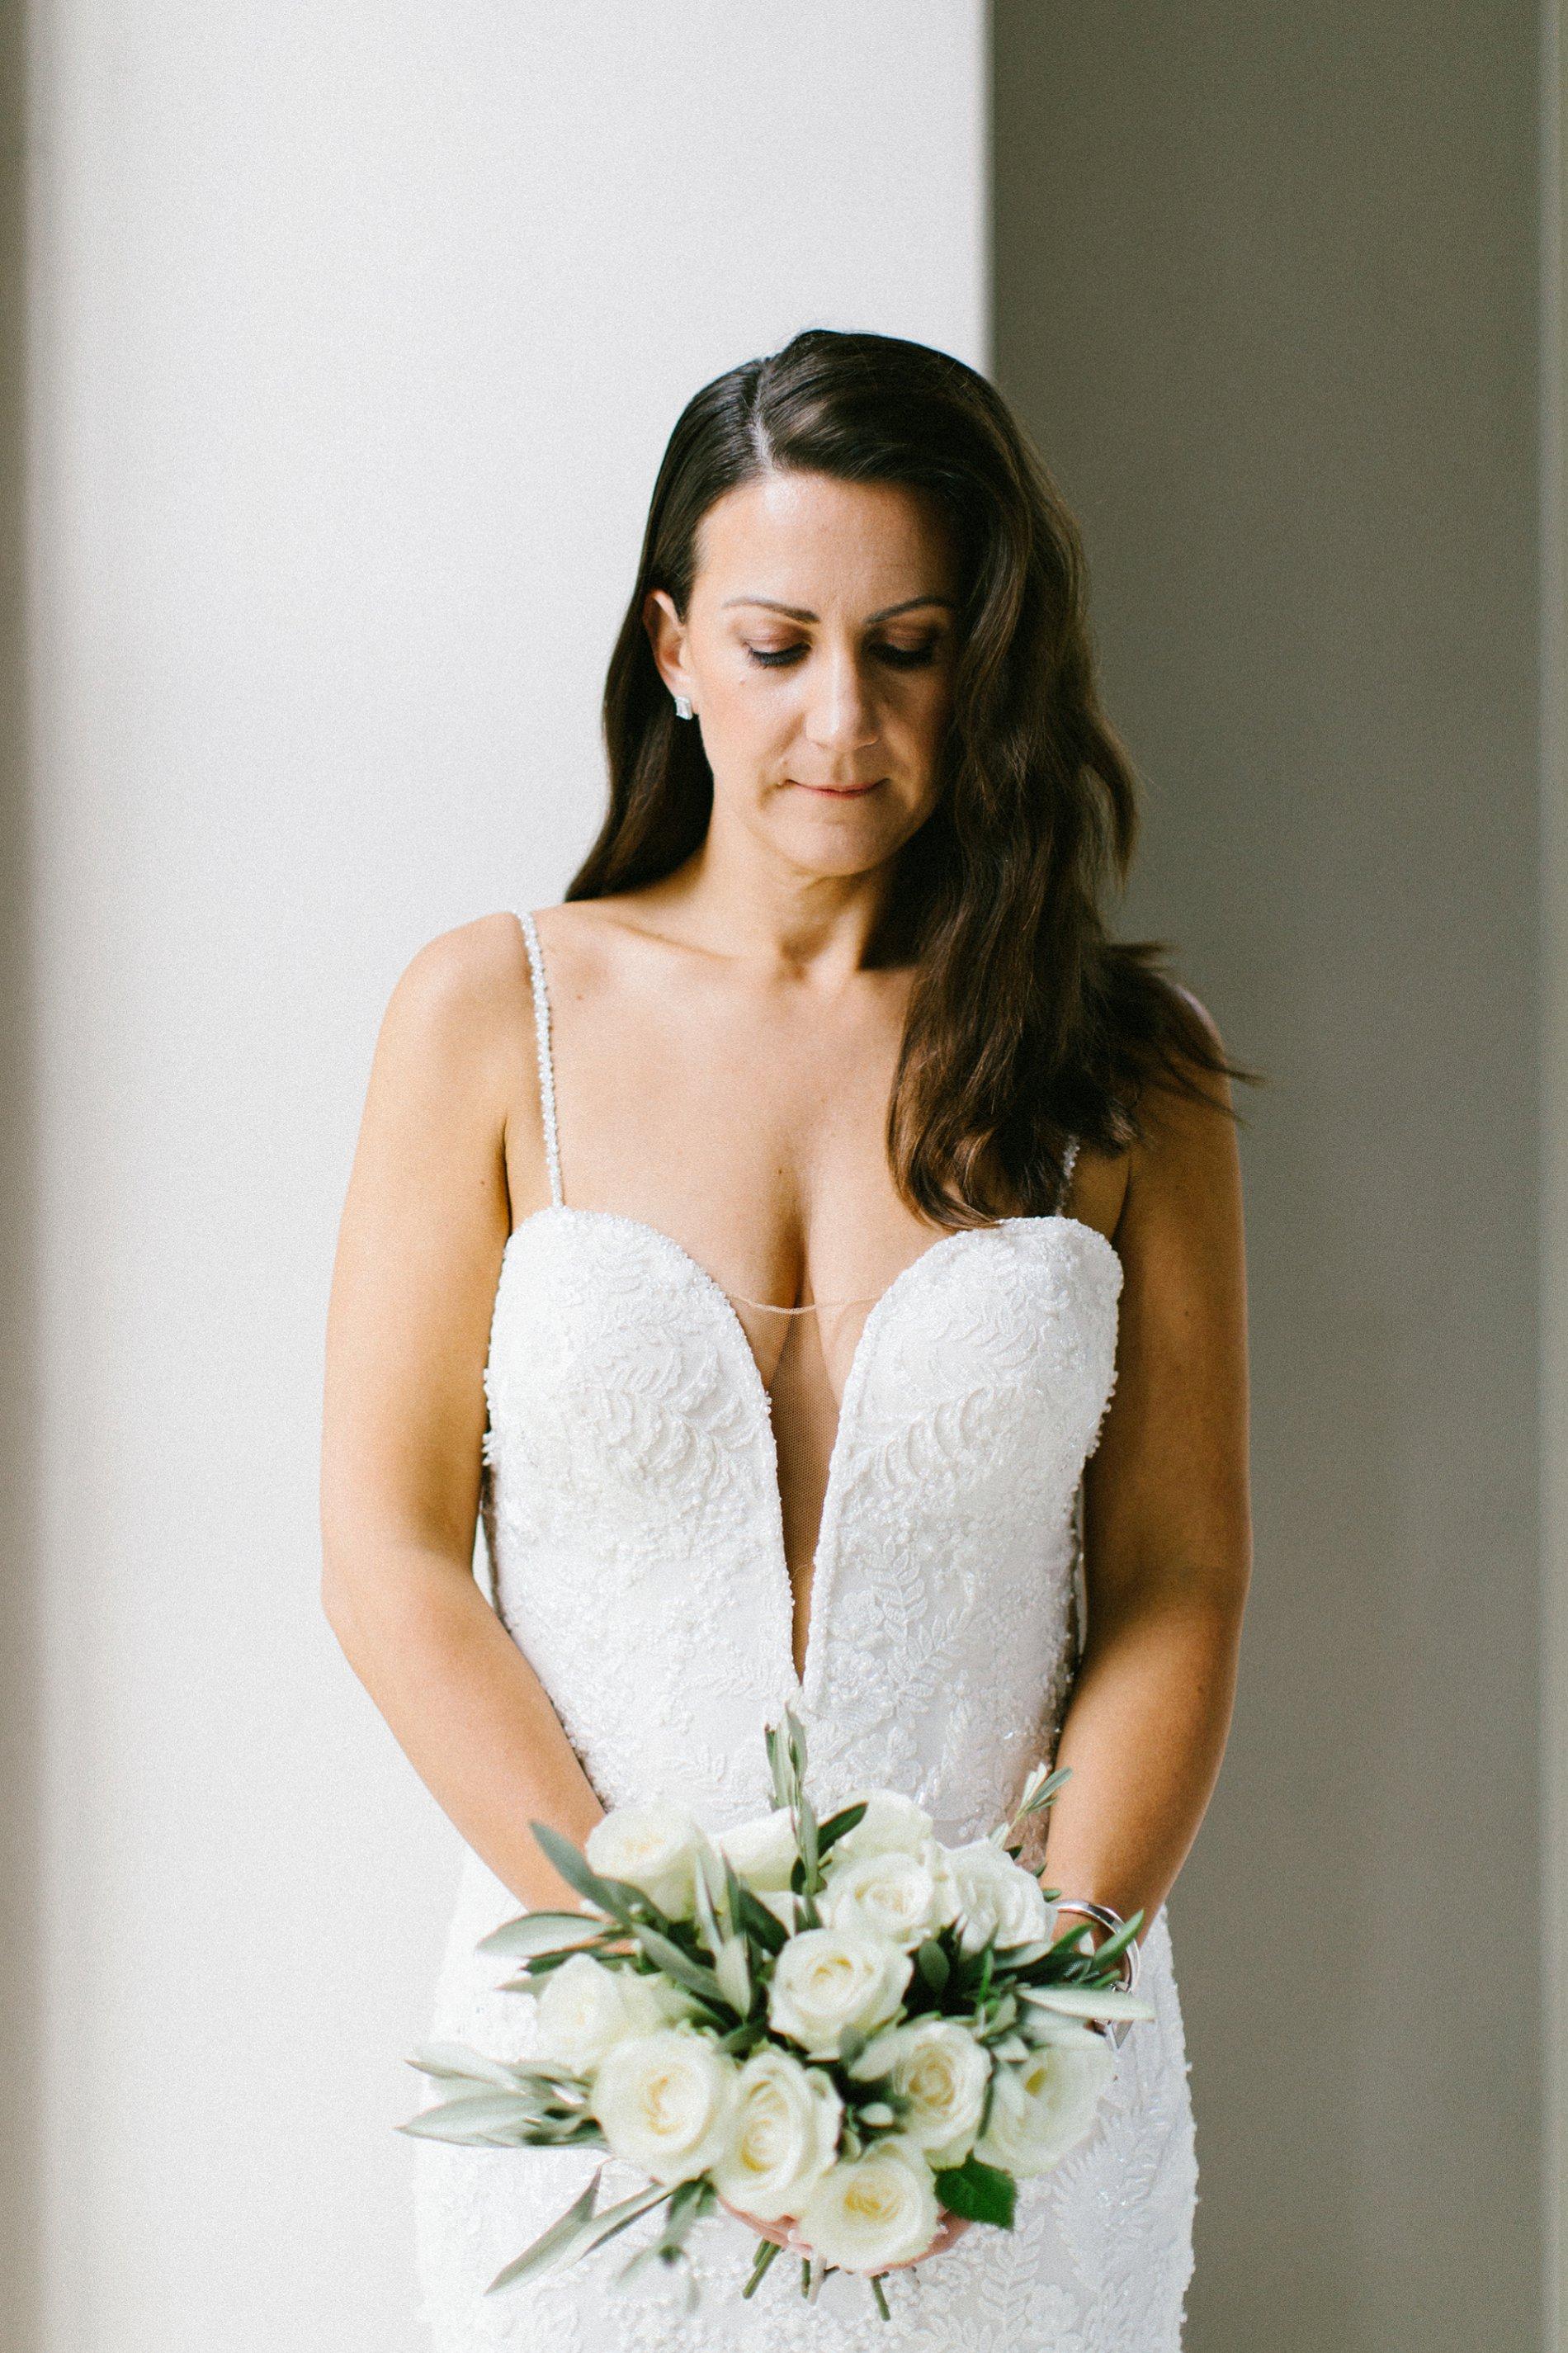 An Intimate Fine Art Wedding Shoot at Newby Hall (c) Melissa Beattie Photography (40)